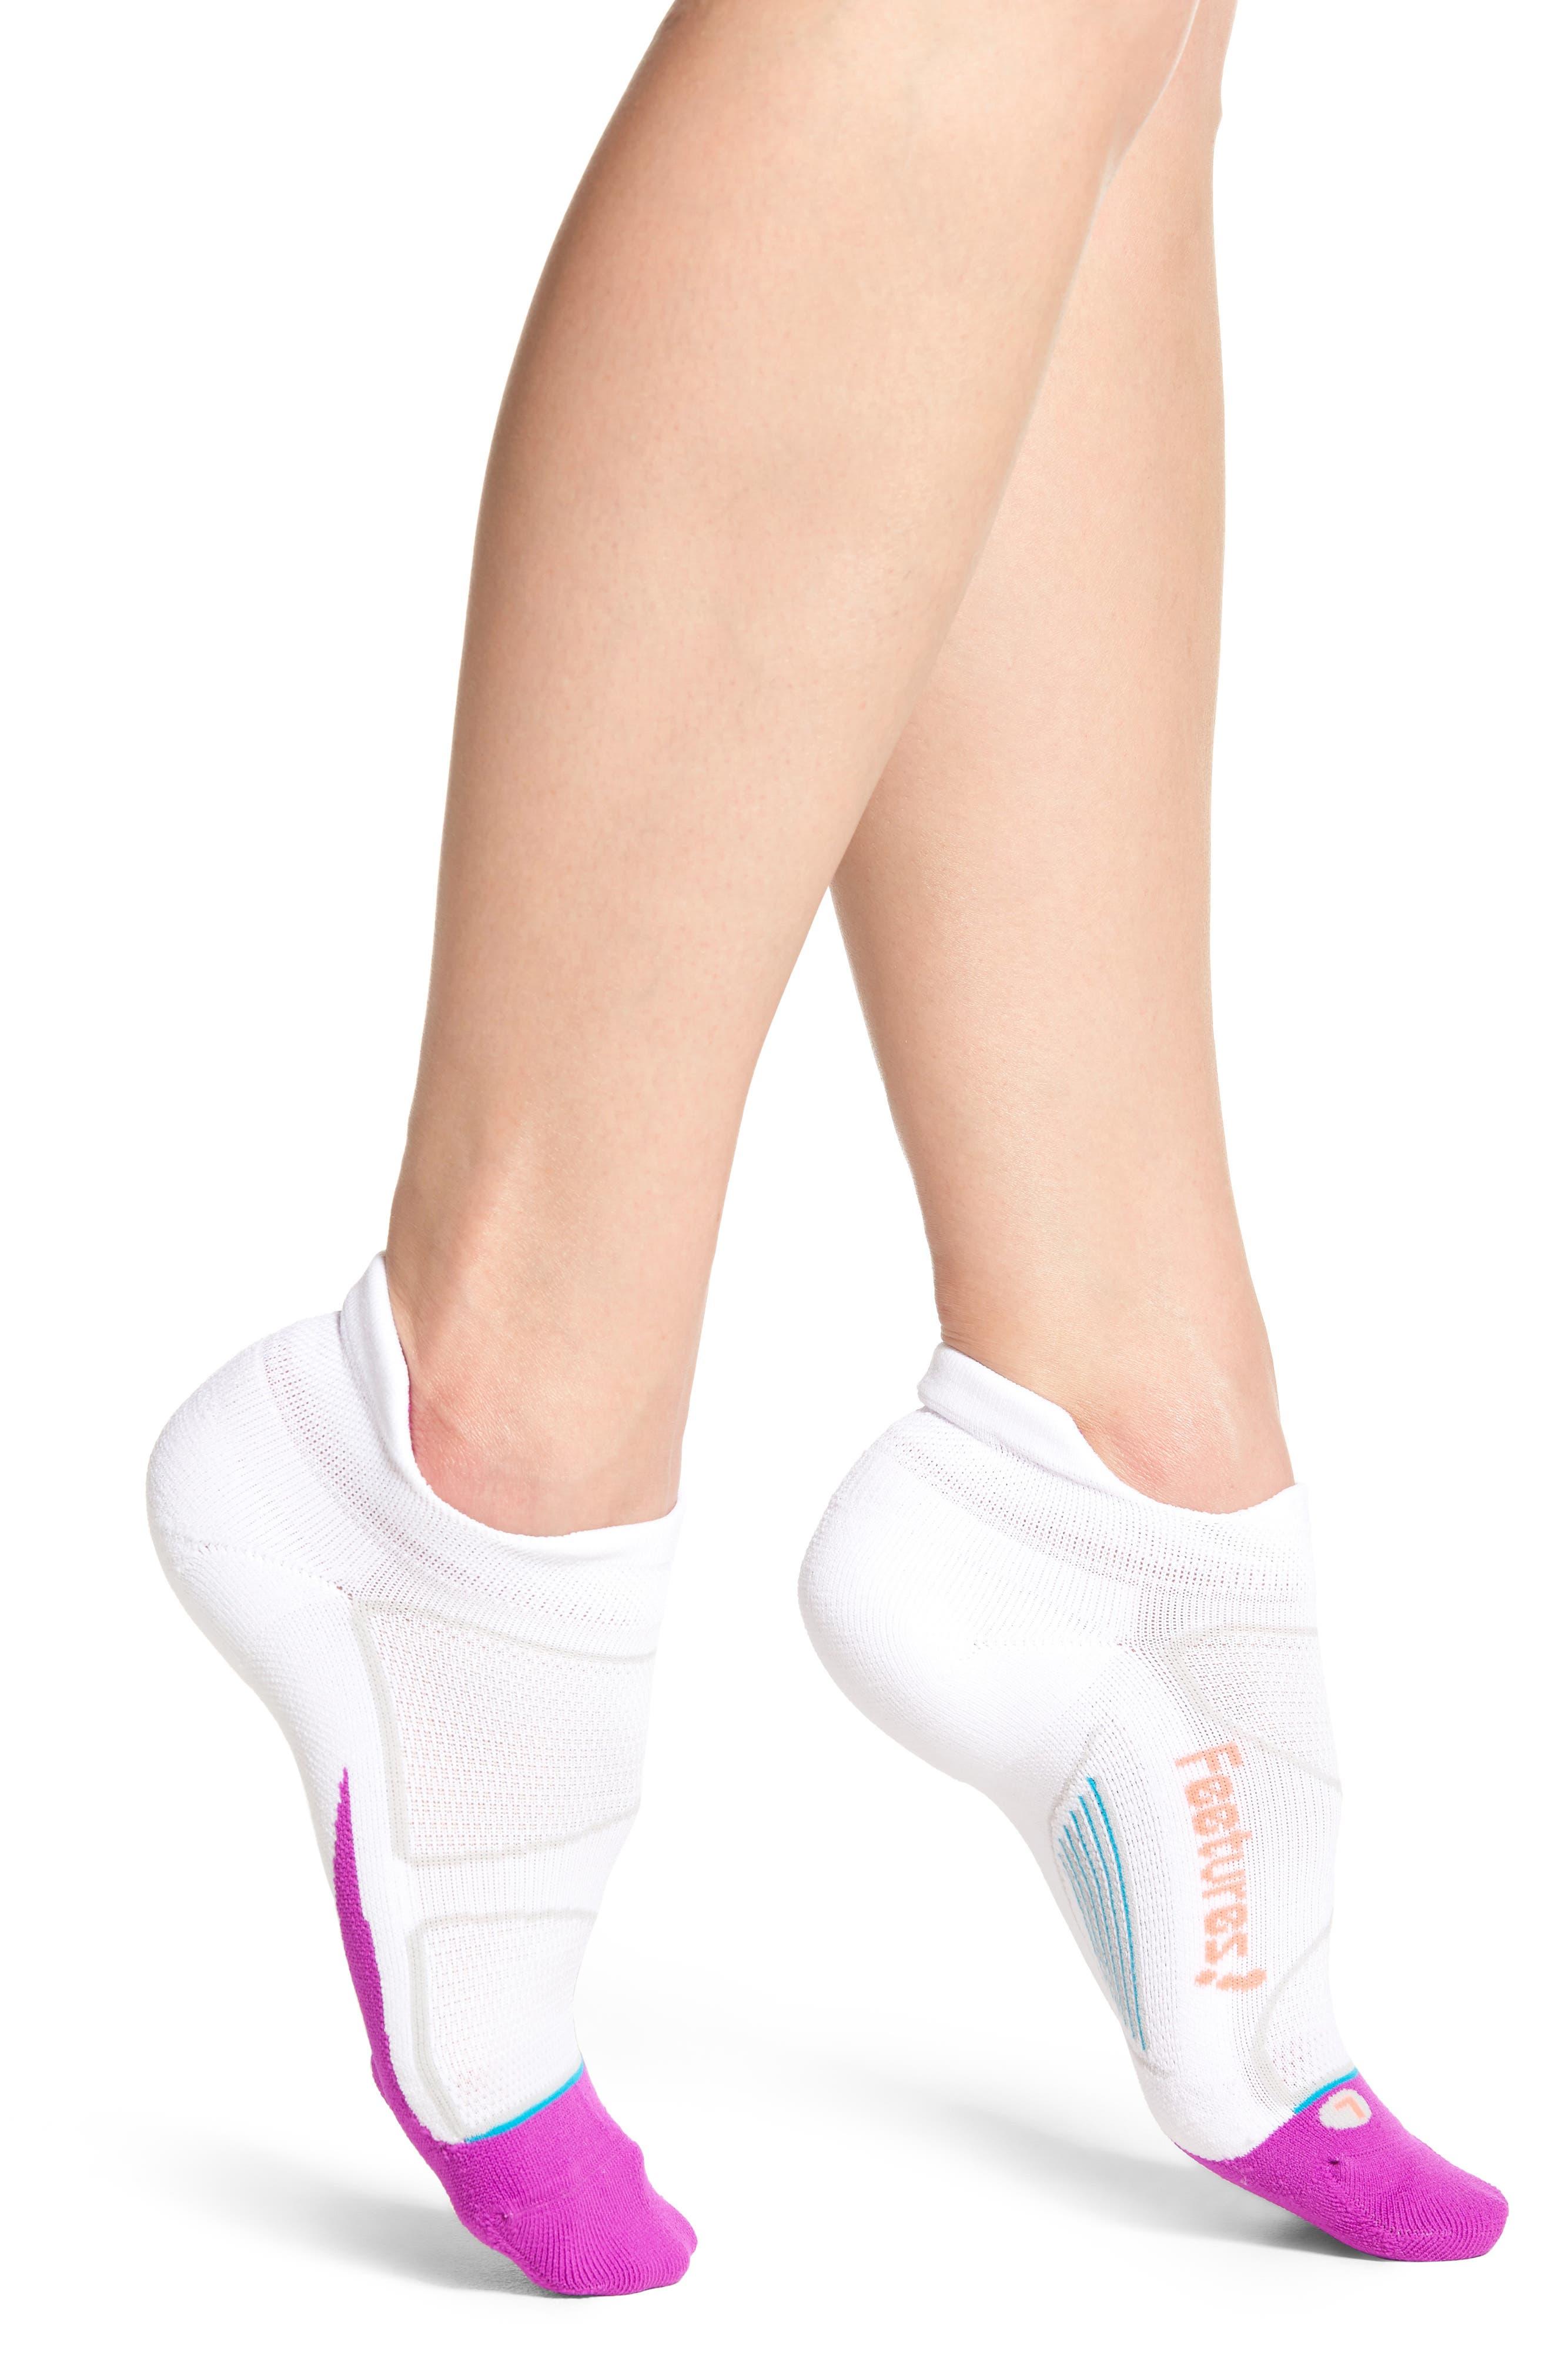 Main Image - Feetures Elite Light No-Show Running Socks